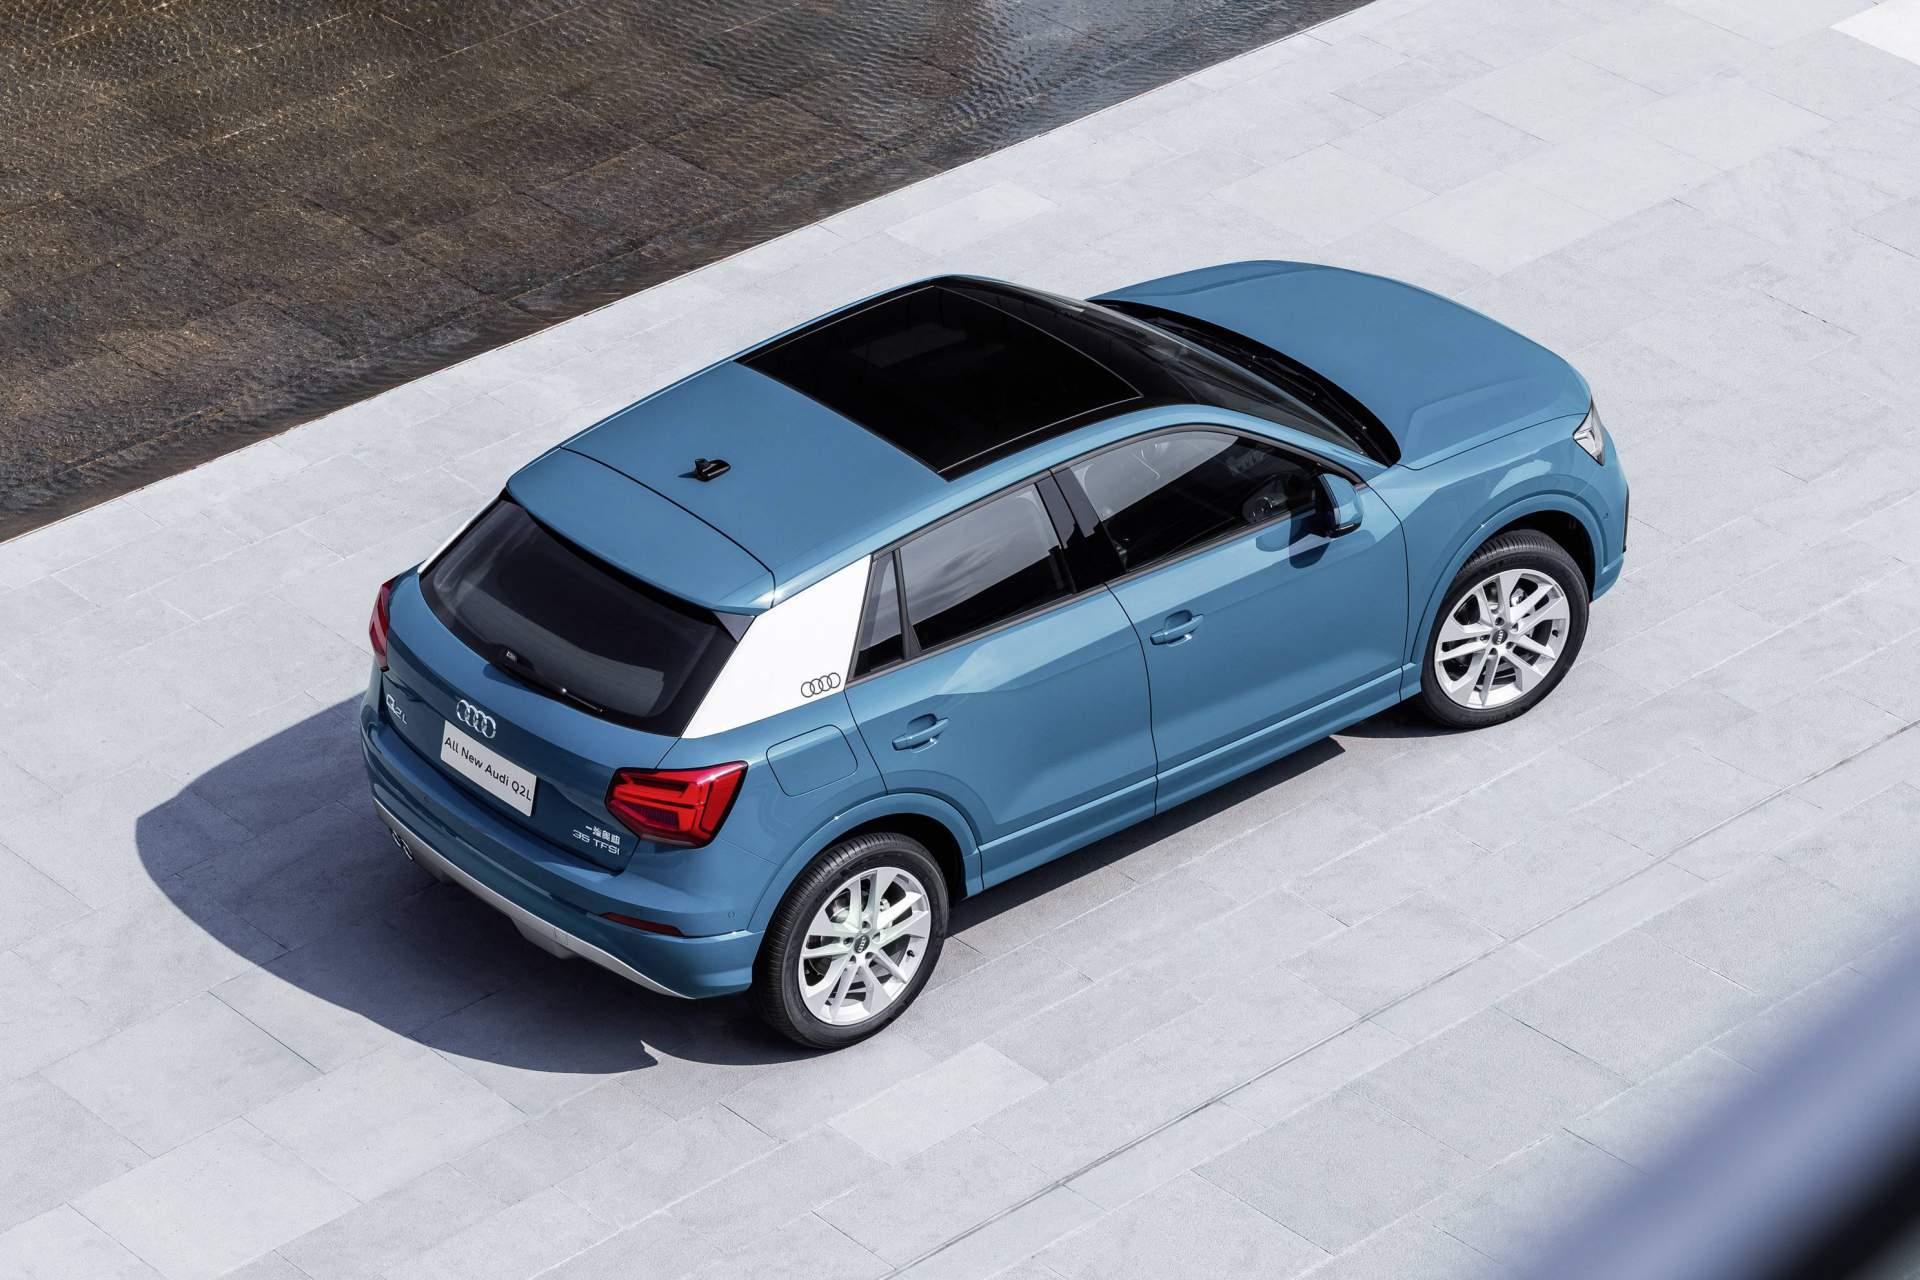 Audi_Q2_L_0028